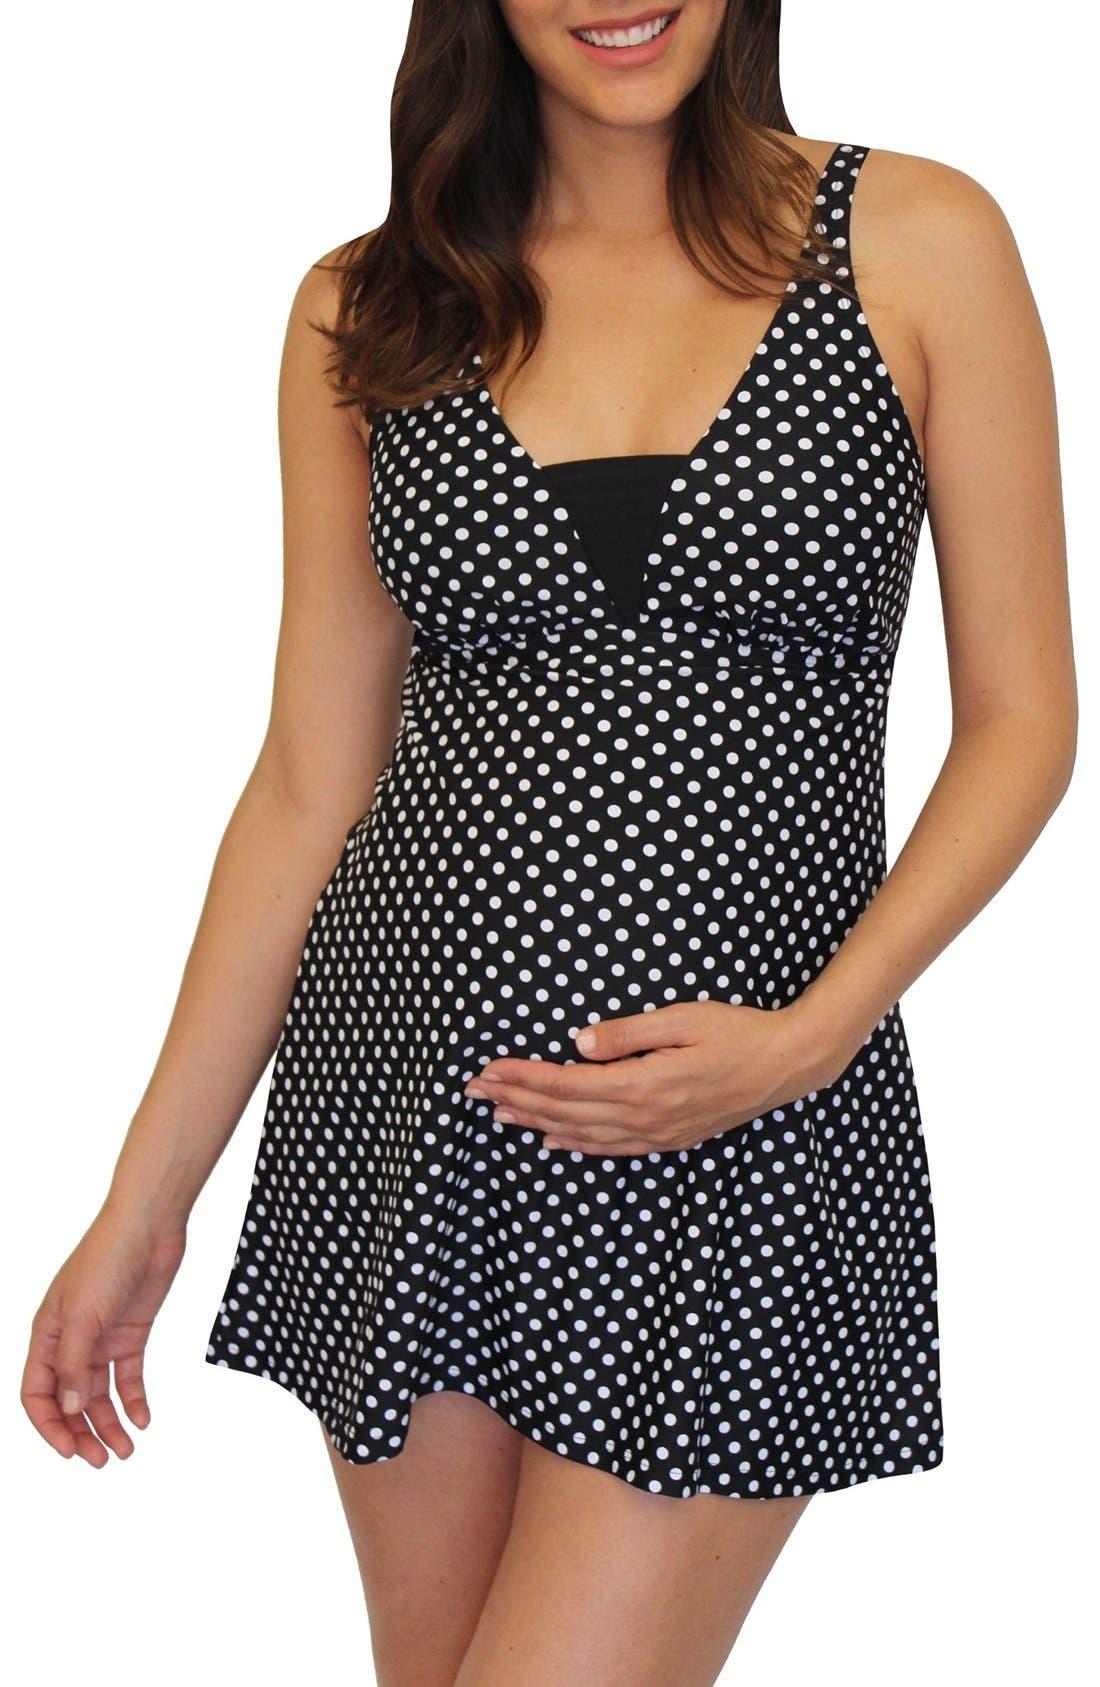 'Dresskini' Maternity Swim Top,                         Main,                         color, Black W/ White Polka Dots